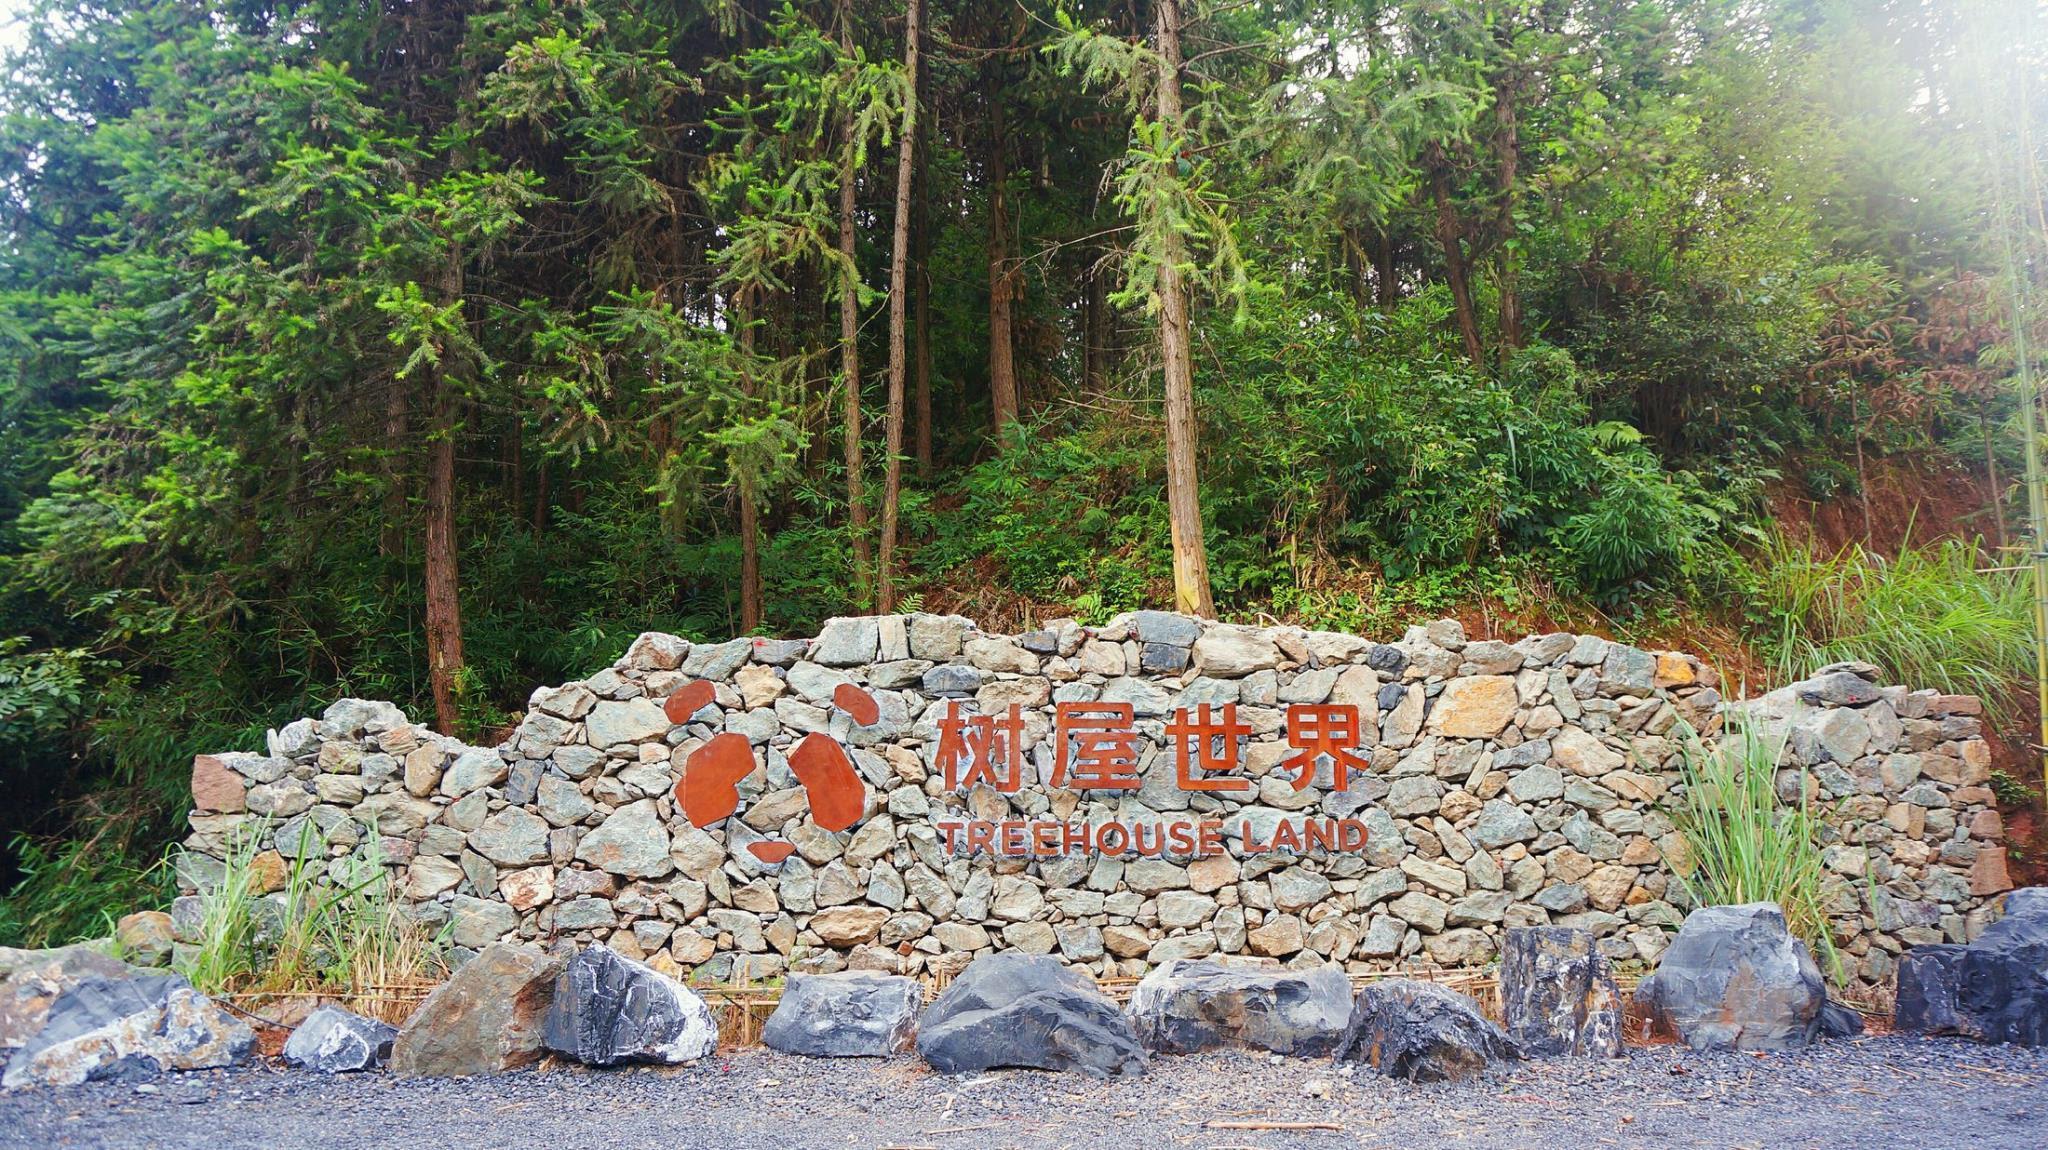 Discount ZYJ Treehouse Land Huangshan Qiyun